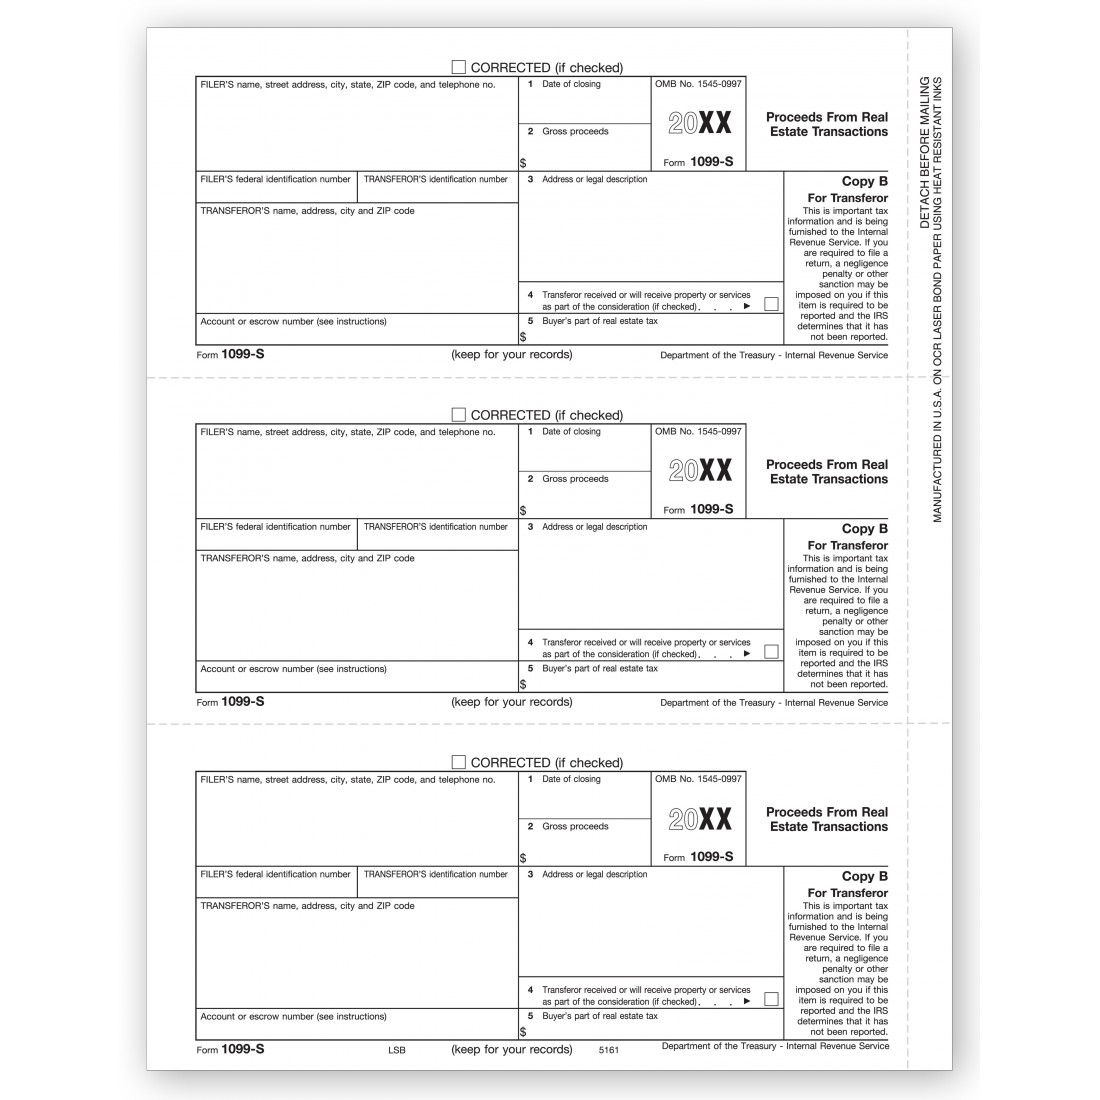 Bulk IRS Tax Form 1099 S Copy B | Free Shipping